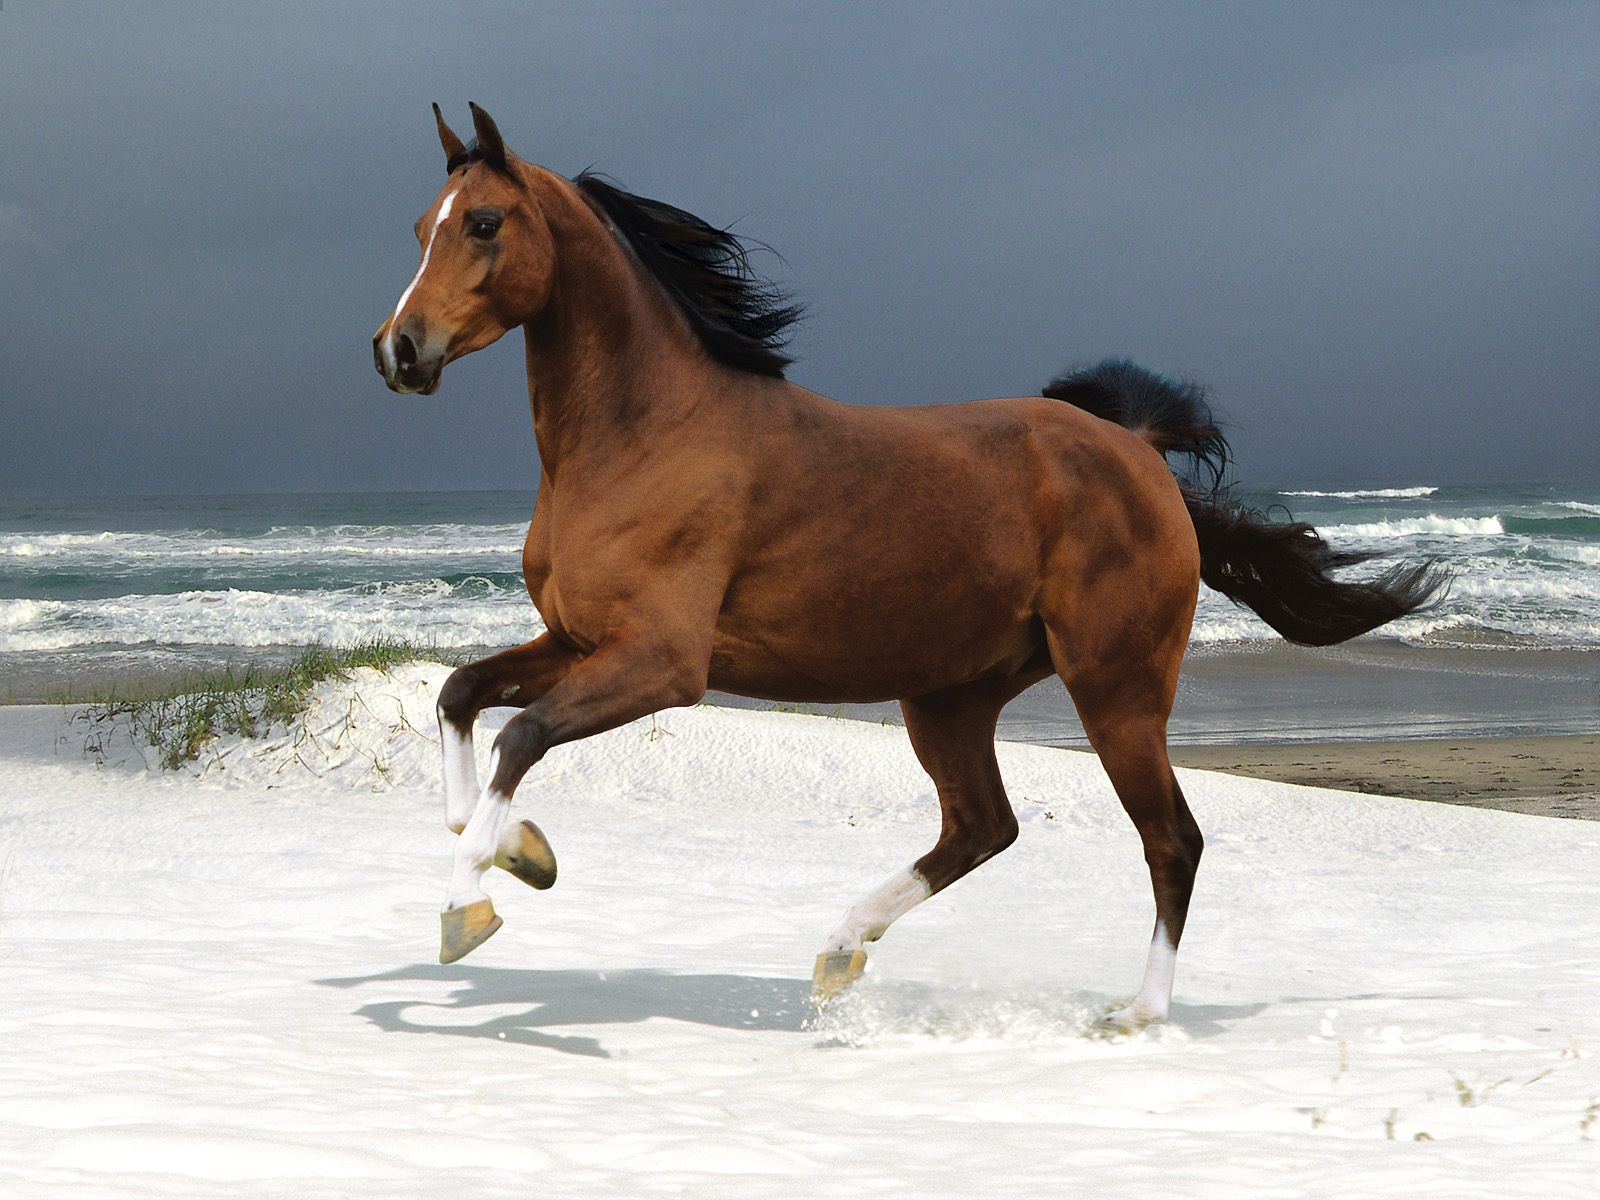 Horses running on the beach wallpaper